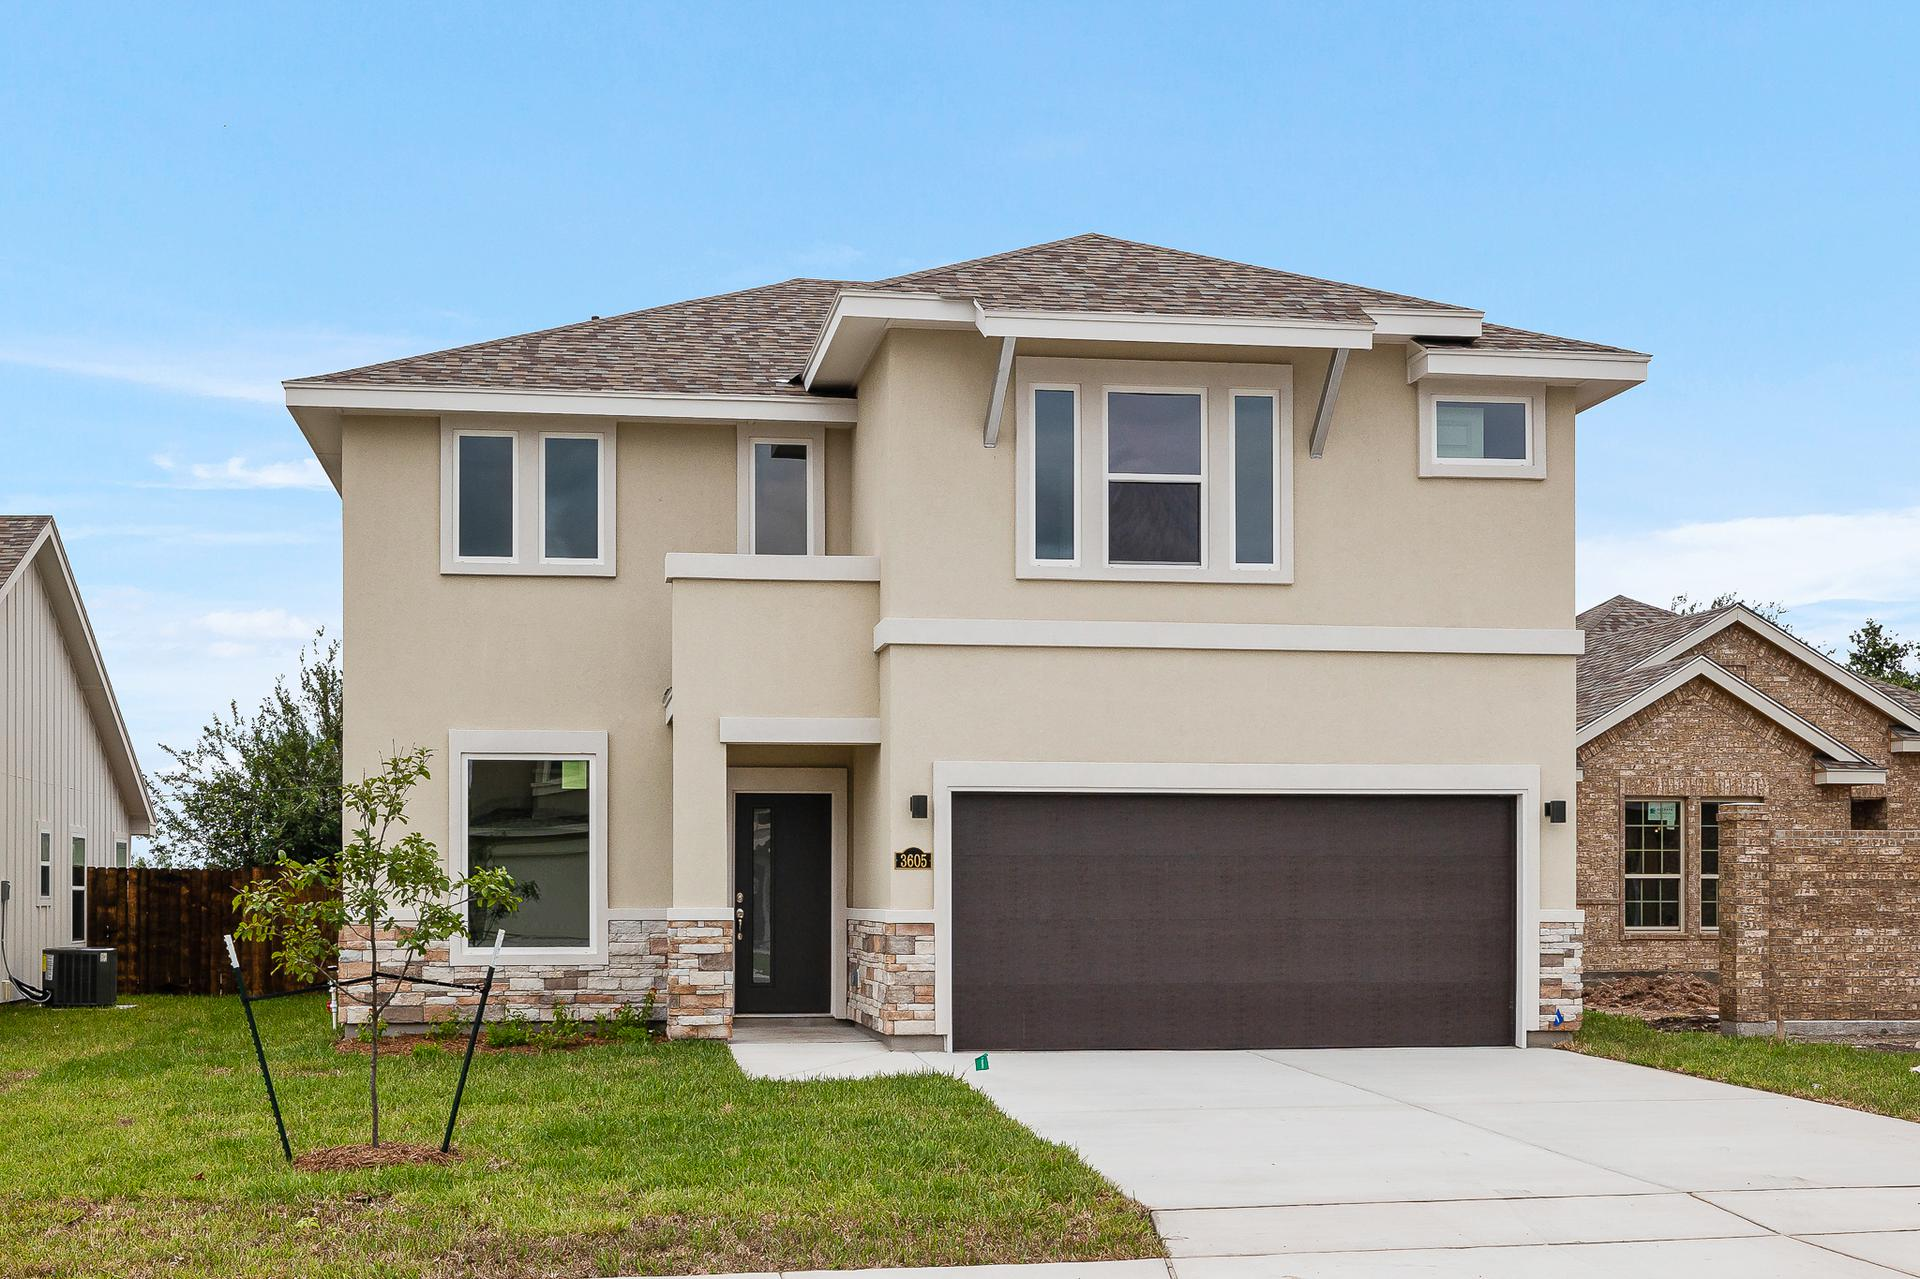 The Monte new home in McAllen TX